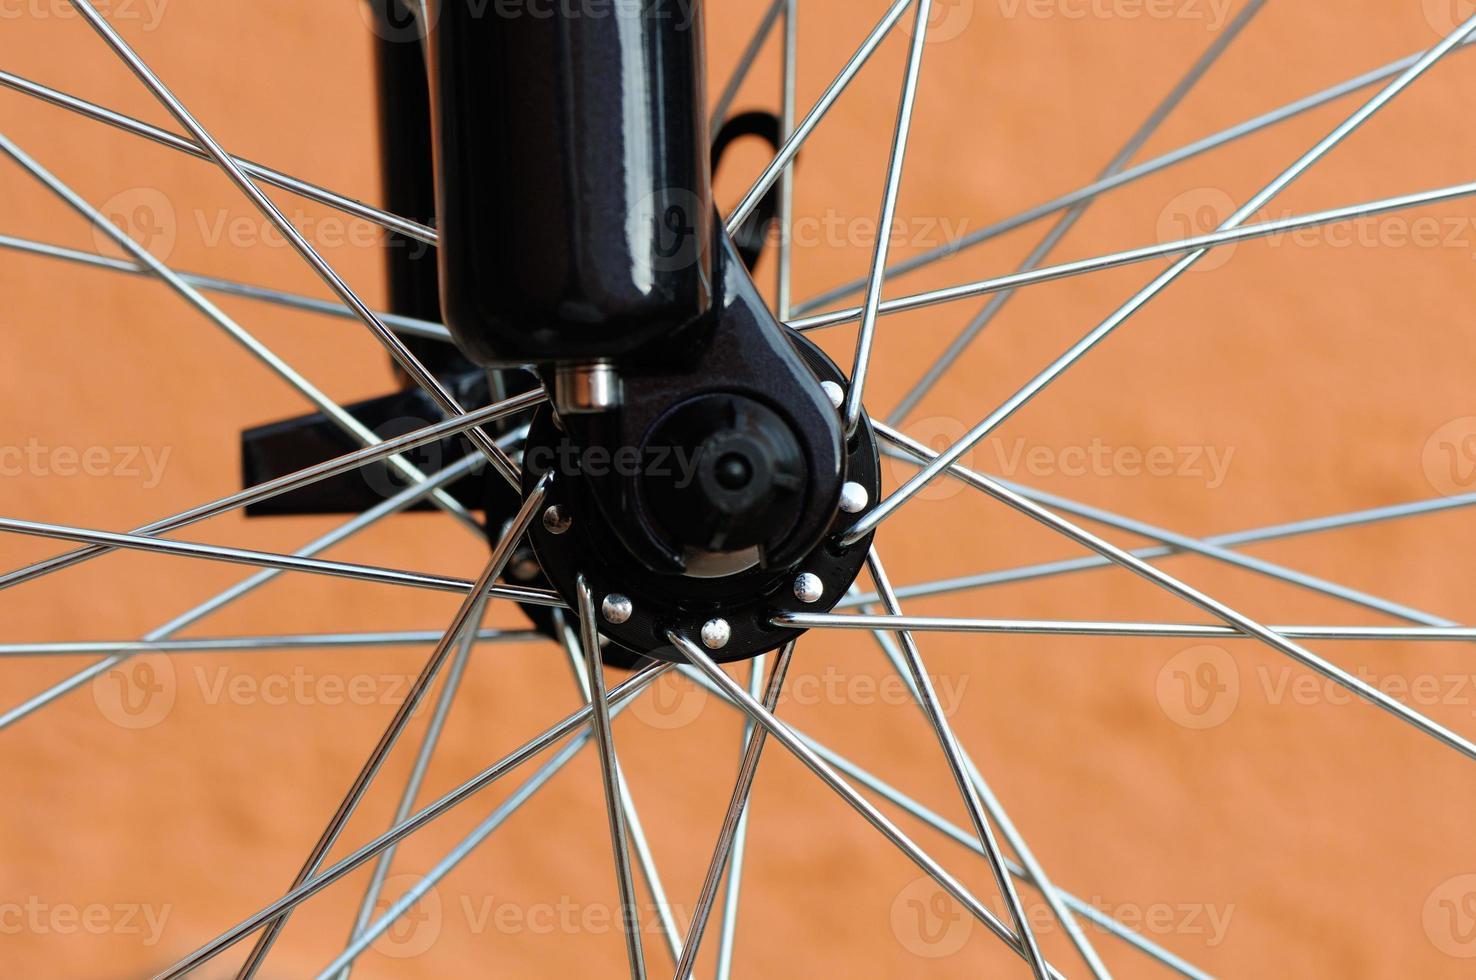 bicycle wheel photo